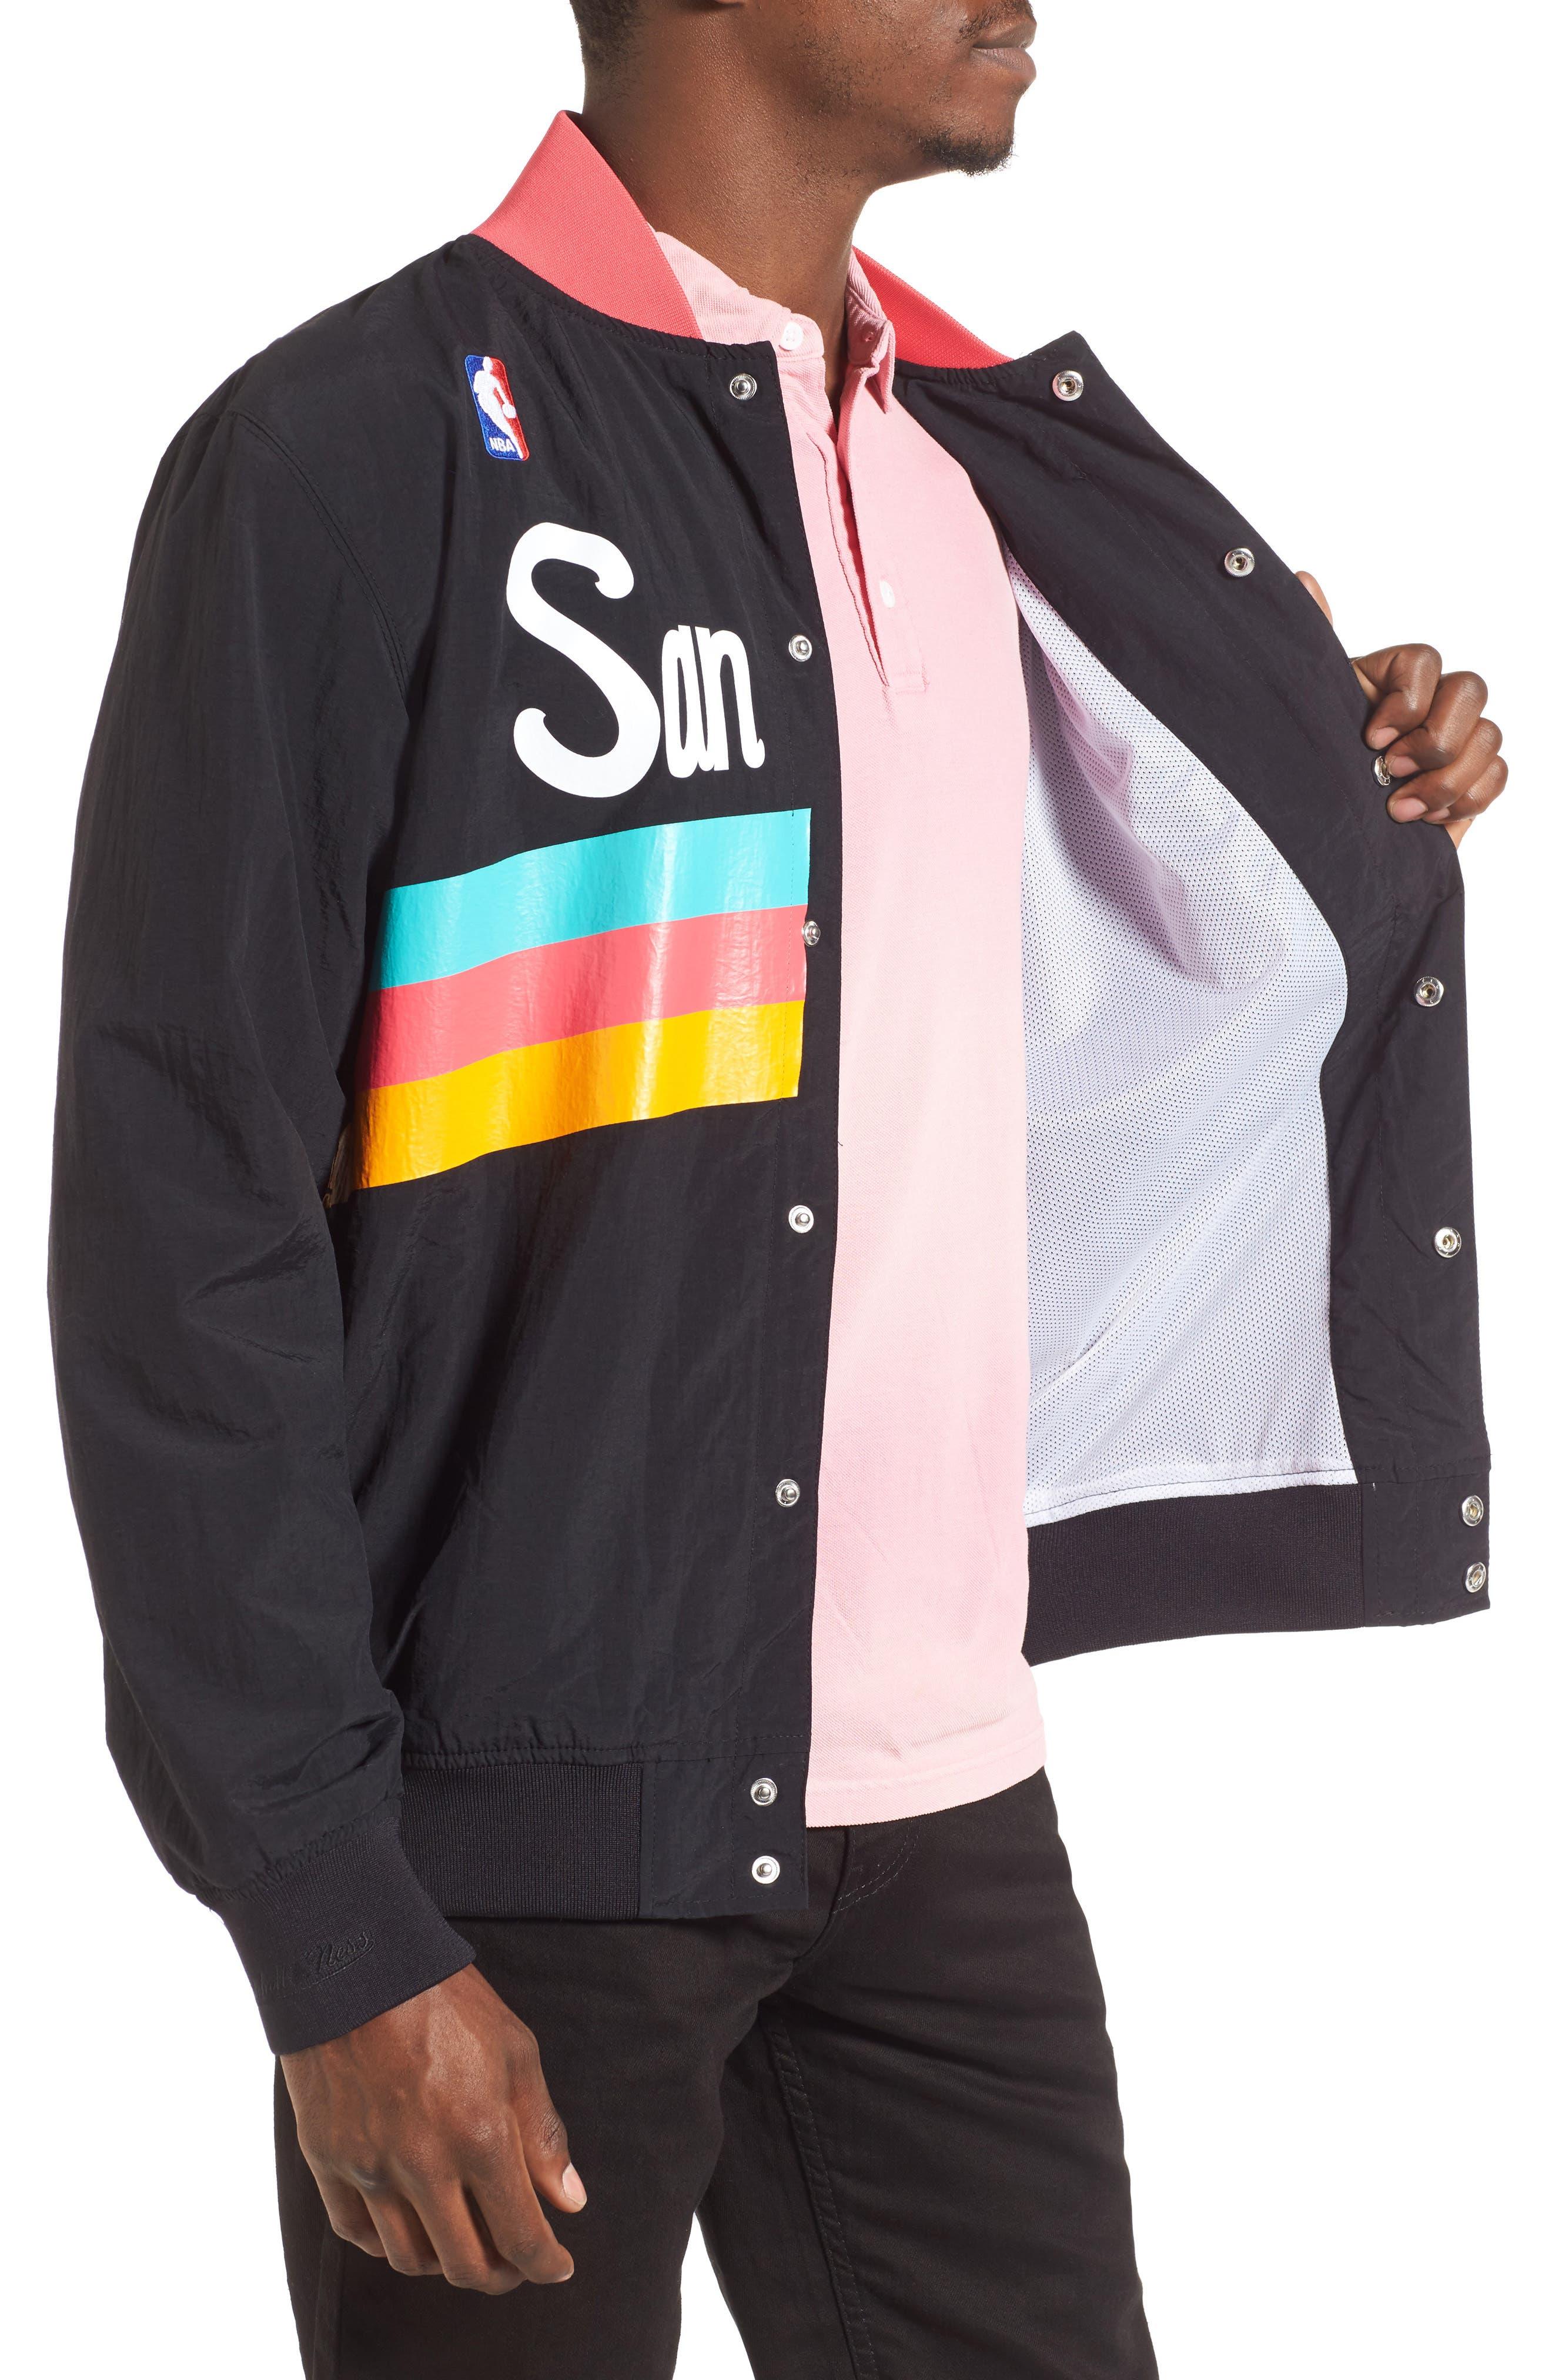 MITCHELL & NESS,                             'San Antonio Spurs' Warm-Up Jacket,                             Alternate thumbnail 4, color,                             001